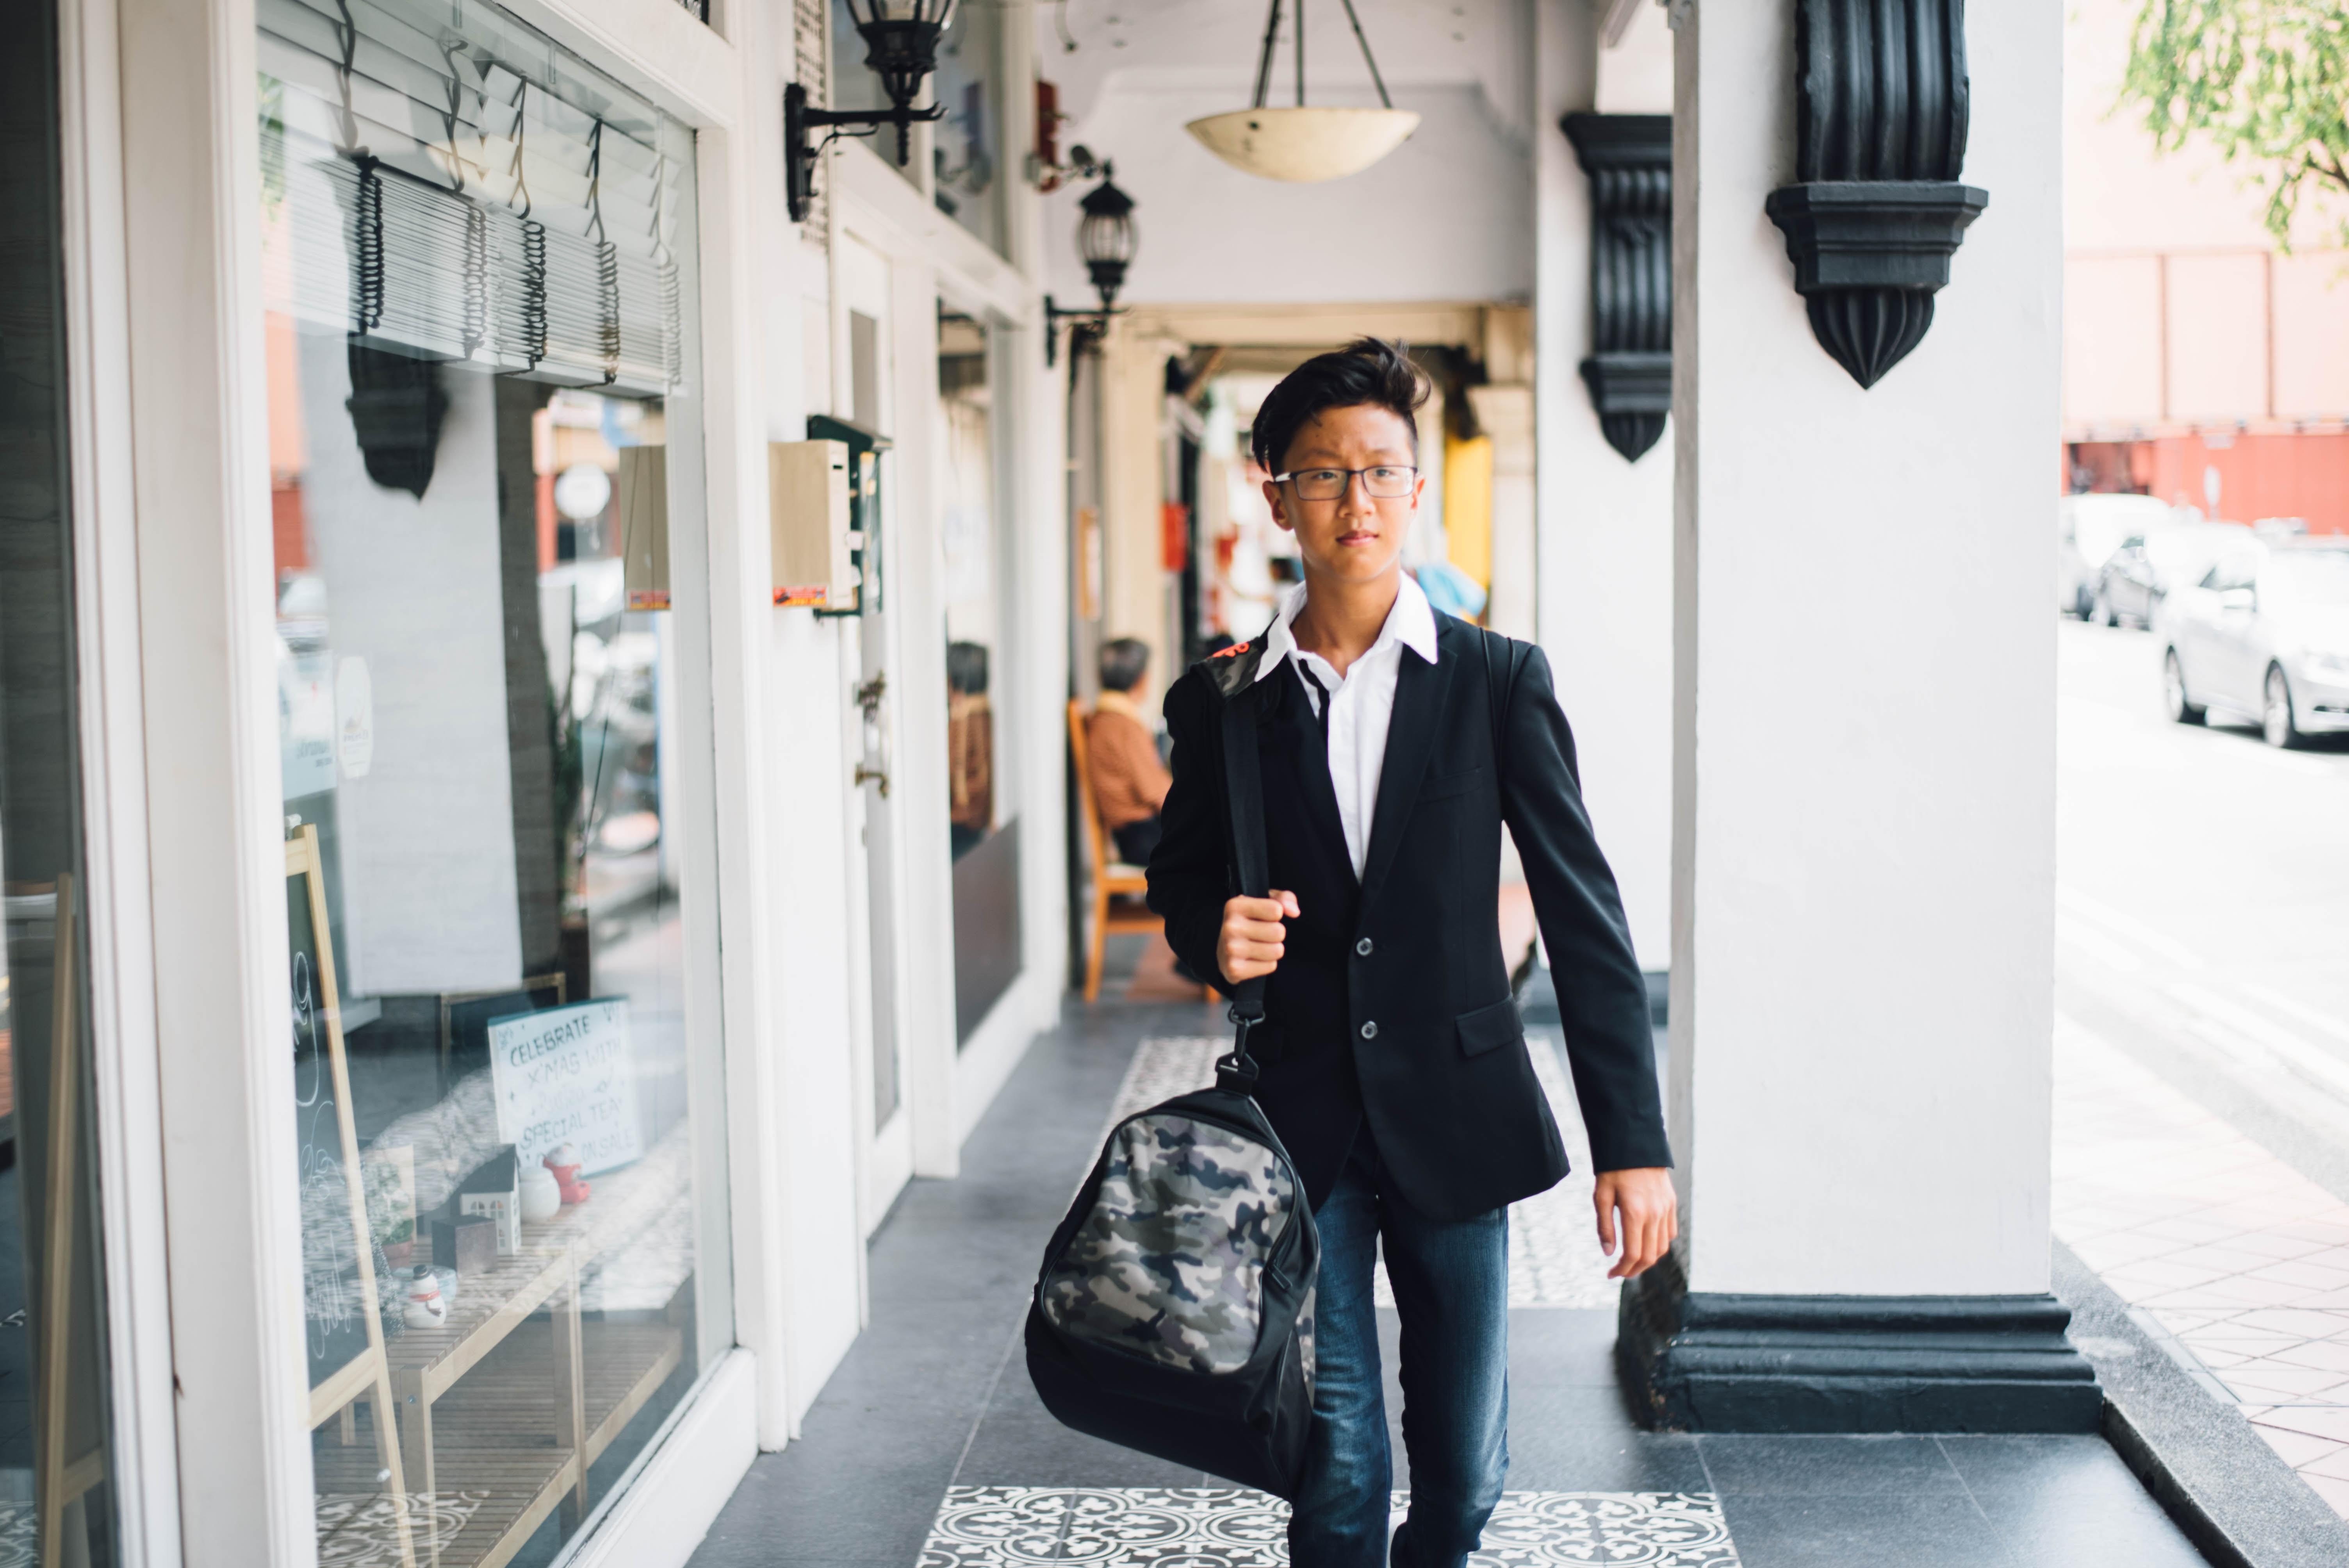 An Asian man walking down the street holding a camouflage duffel bag